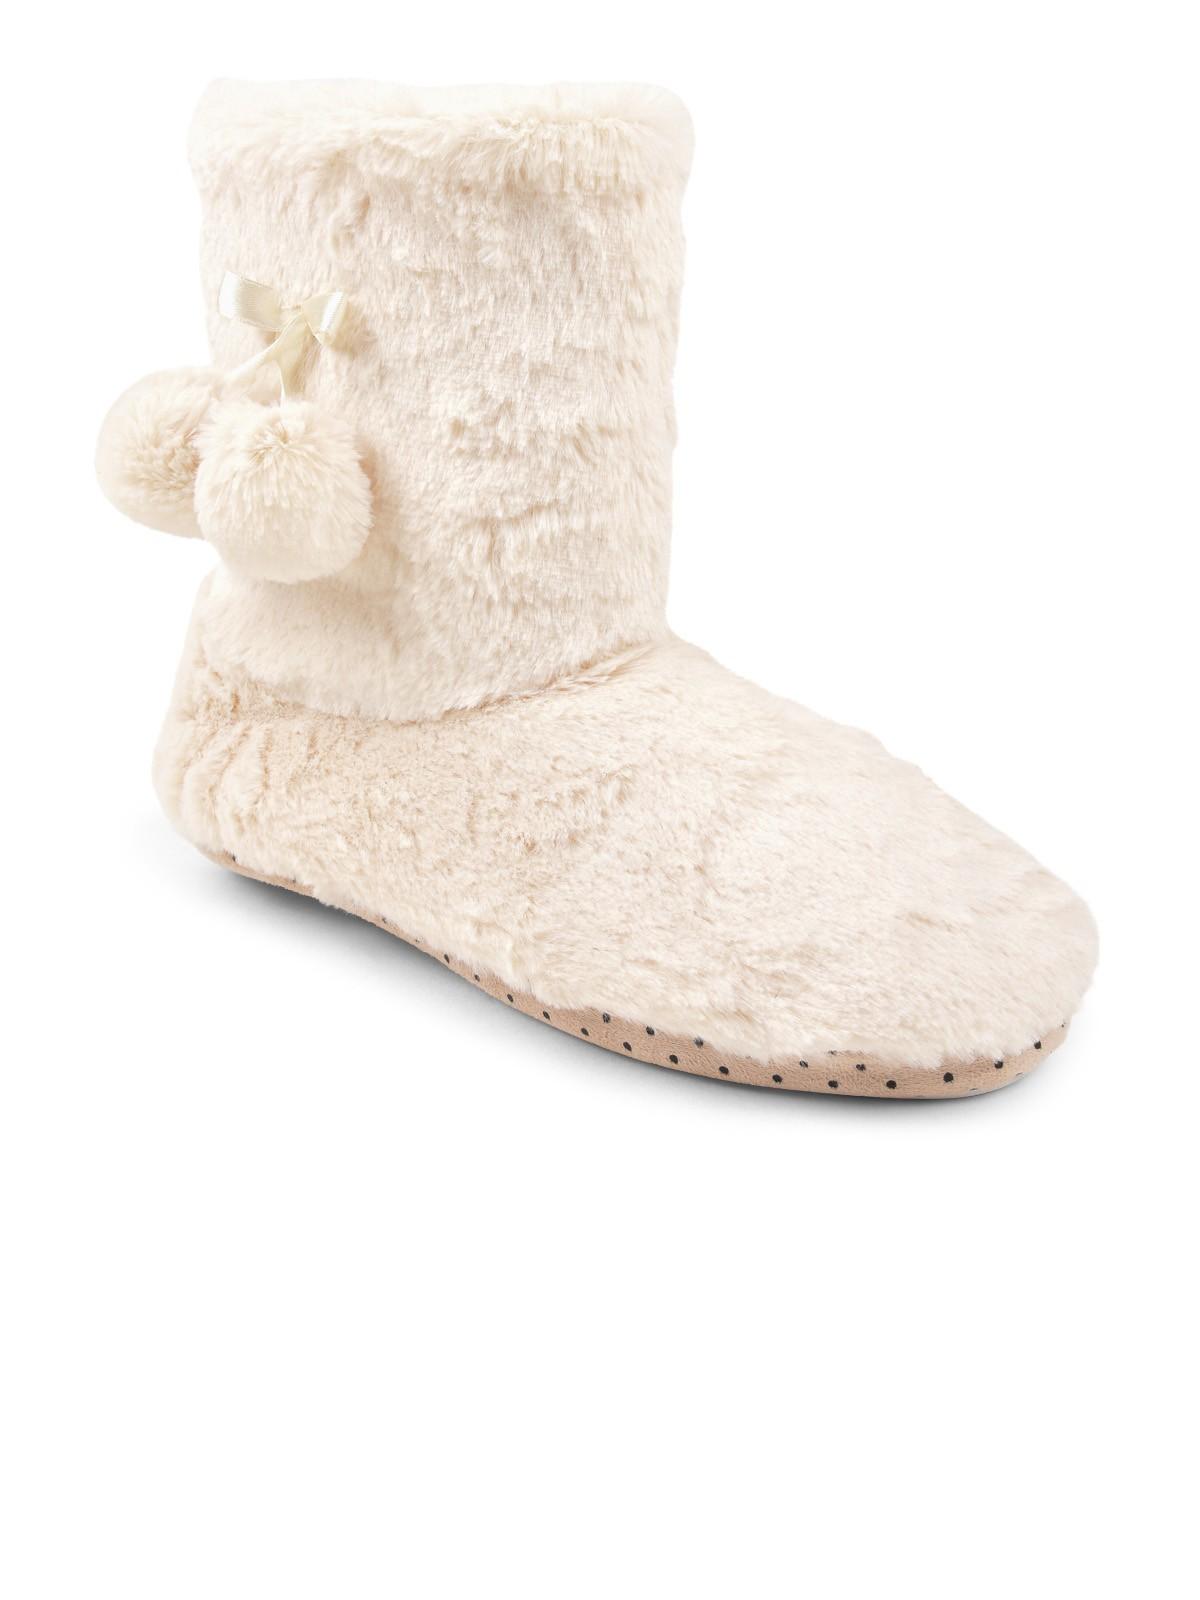 b7e515bf5f4a43 Pantoufles bottes blanches Femme - DistriCenter